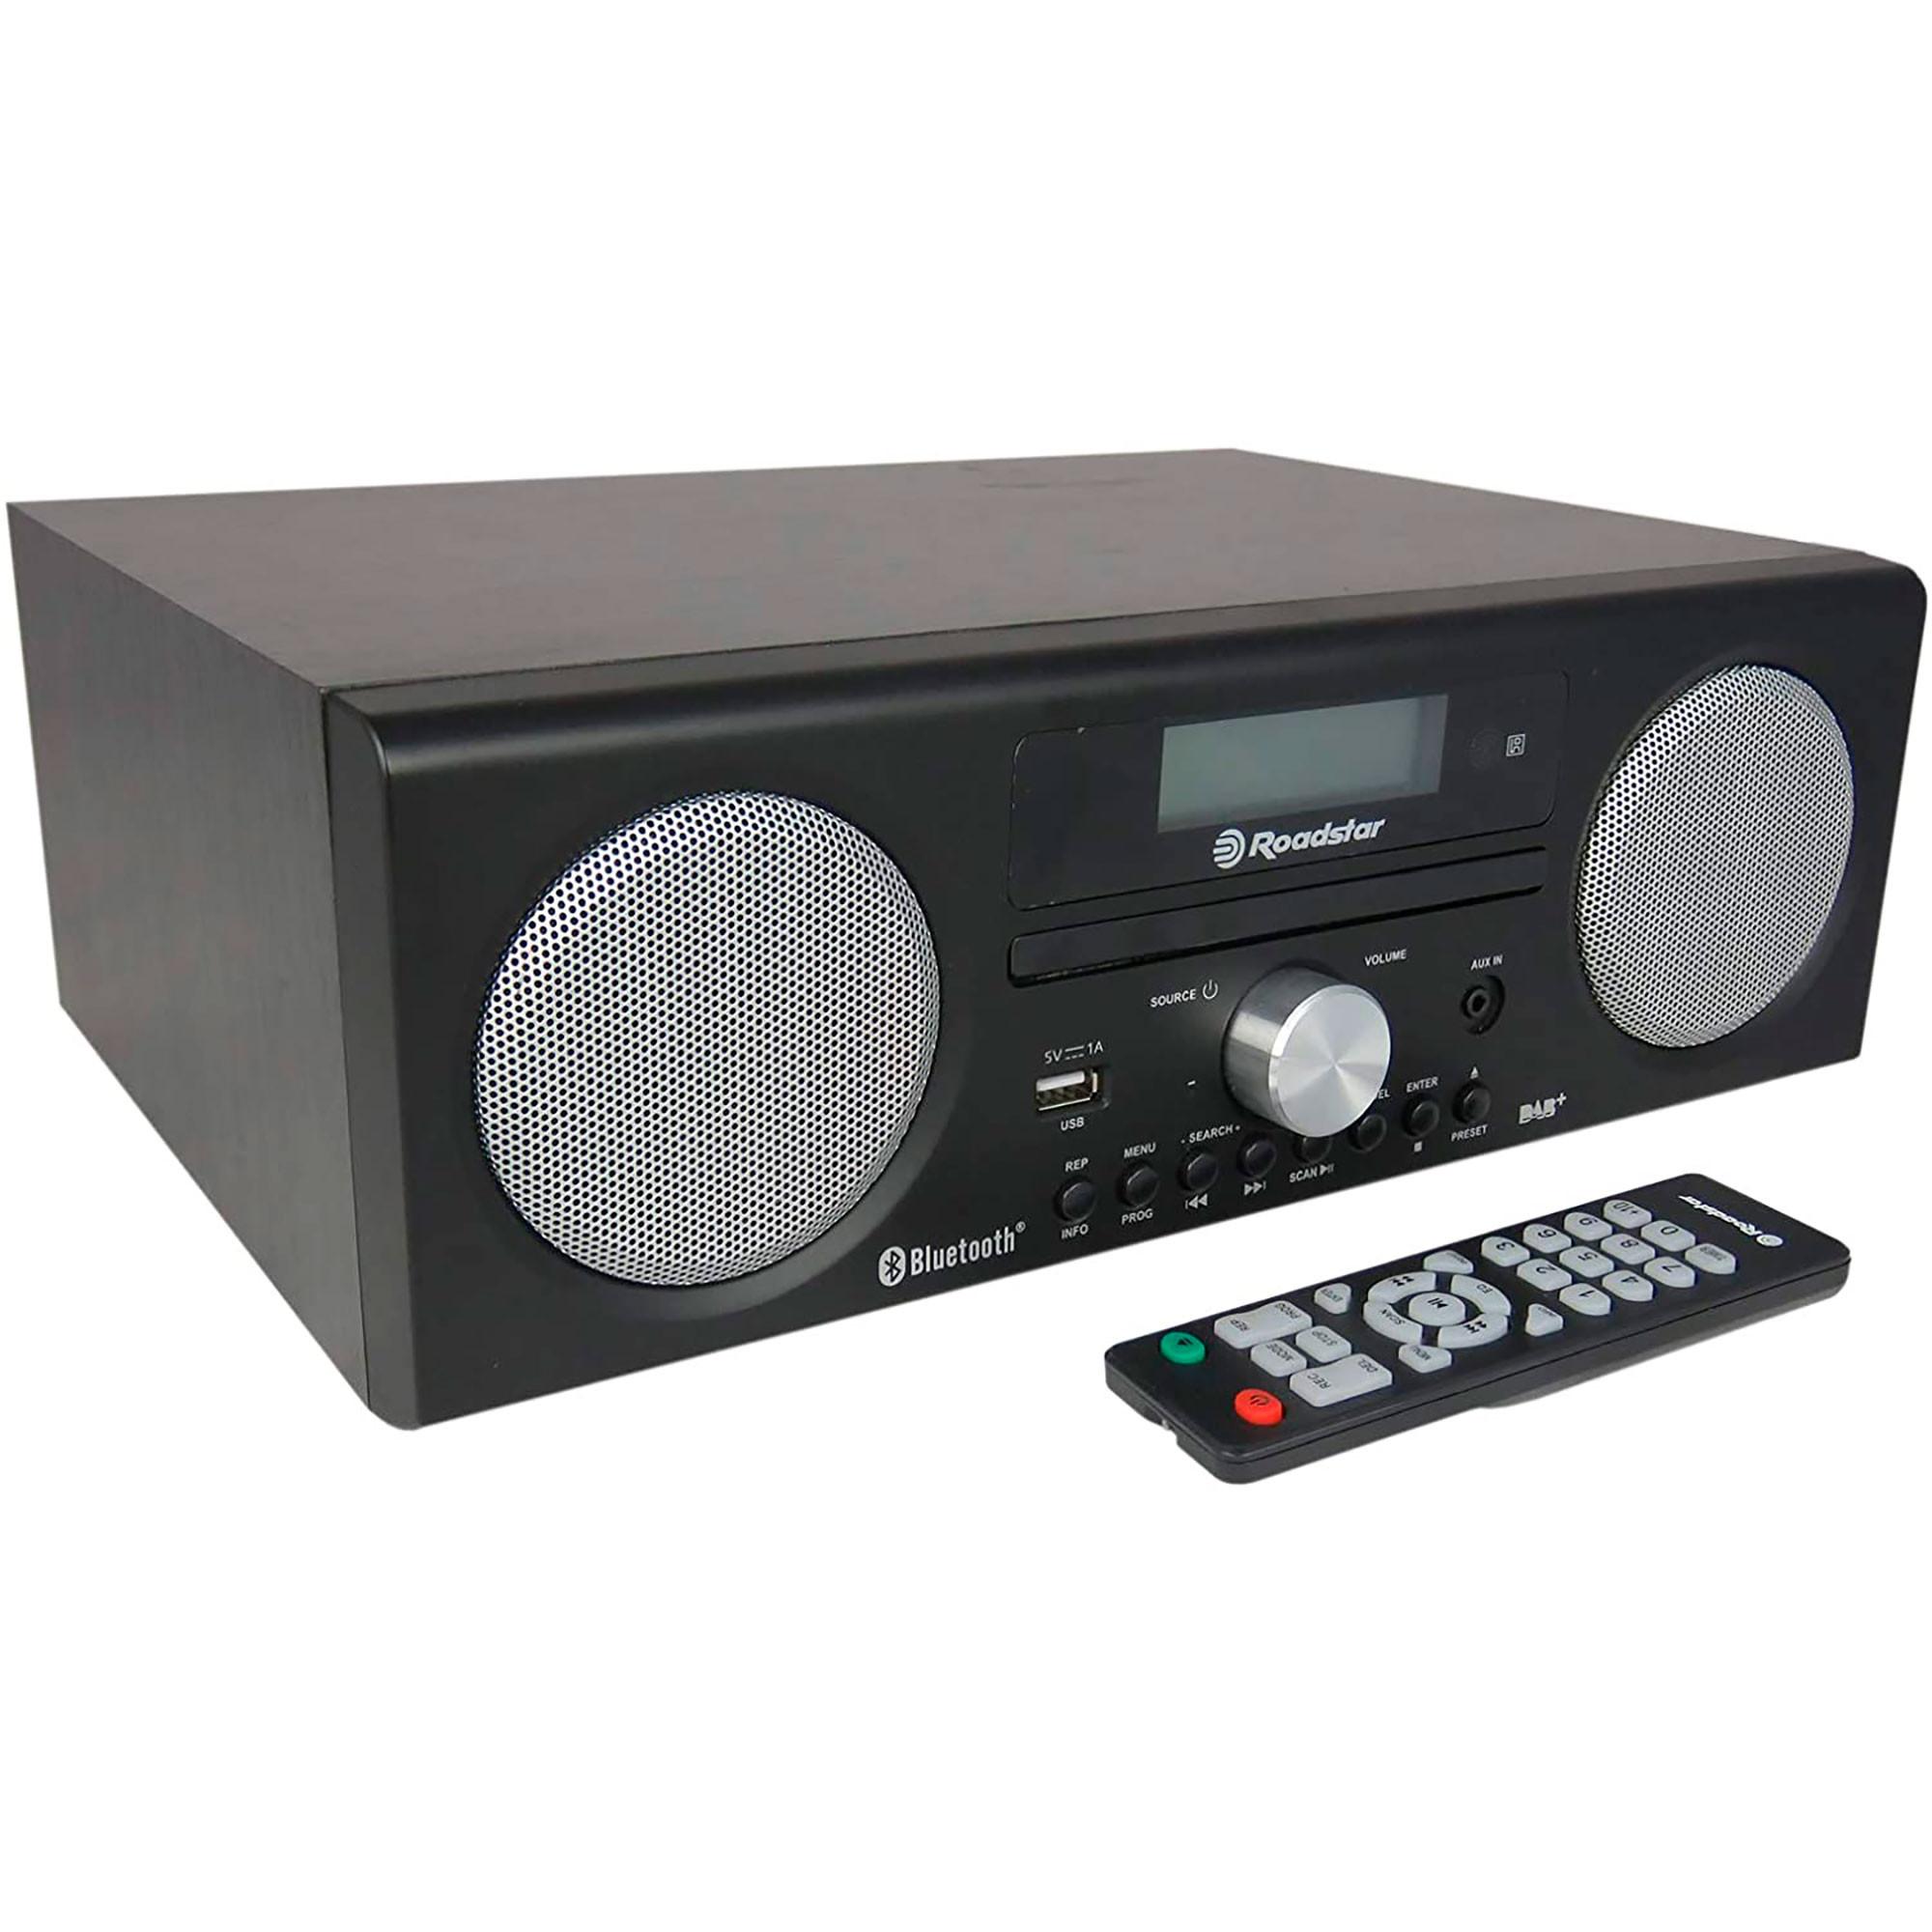 Roadstar HRA9DBT-BK Radio Portátil DAB/DAB+/FM, Reproductor CD-MP3, Bluetooth, USB, AUX-IN, Grabador, Pantalla LCD, Mando a Distancia, Negro